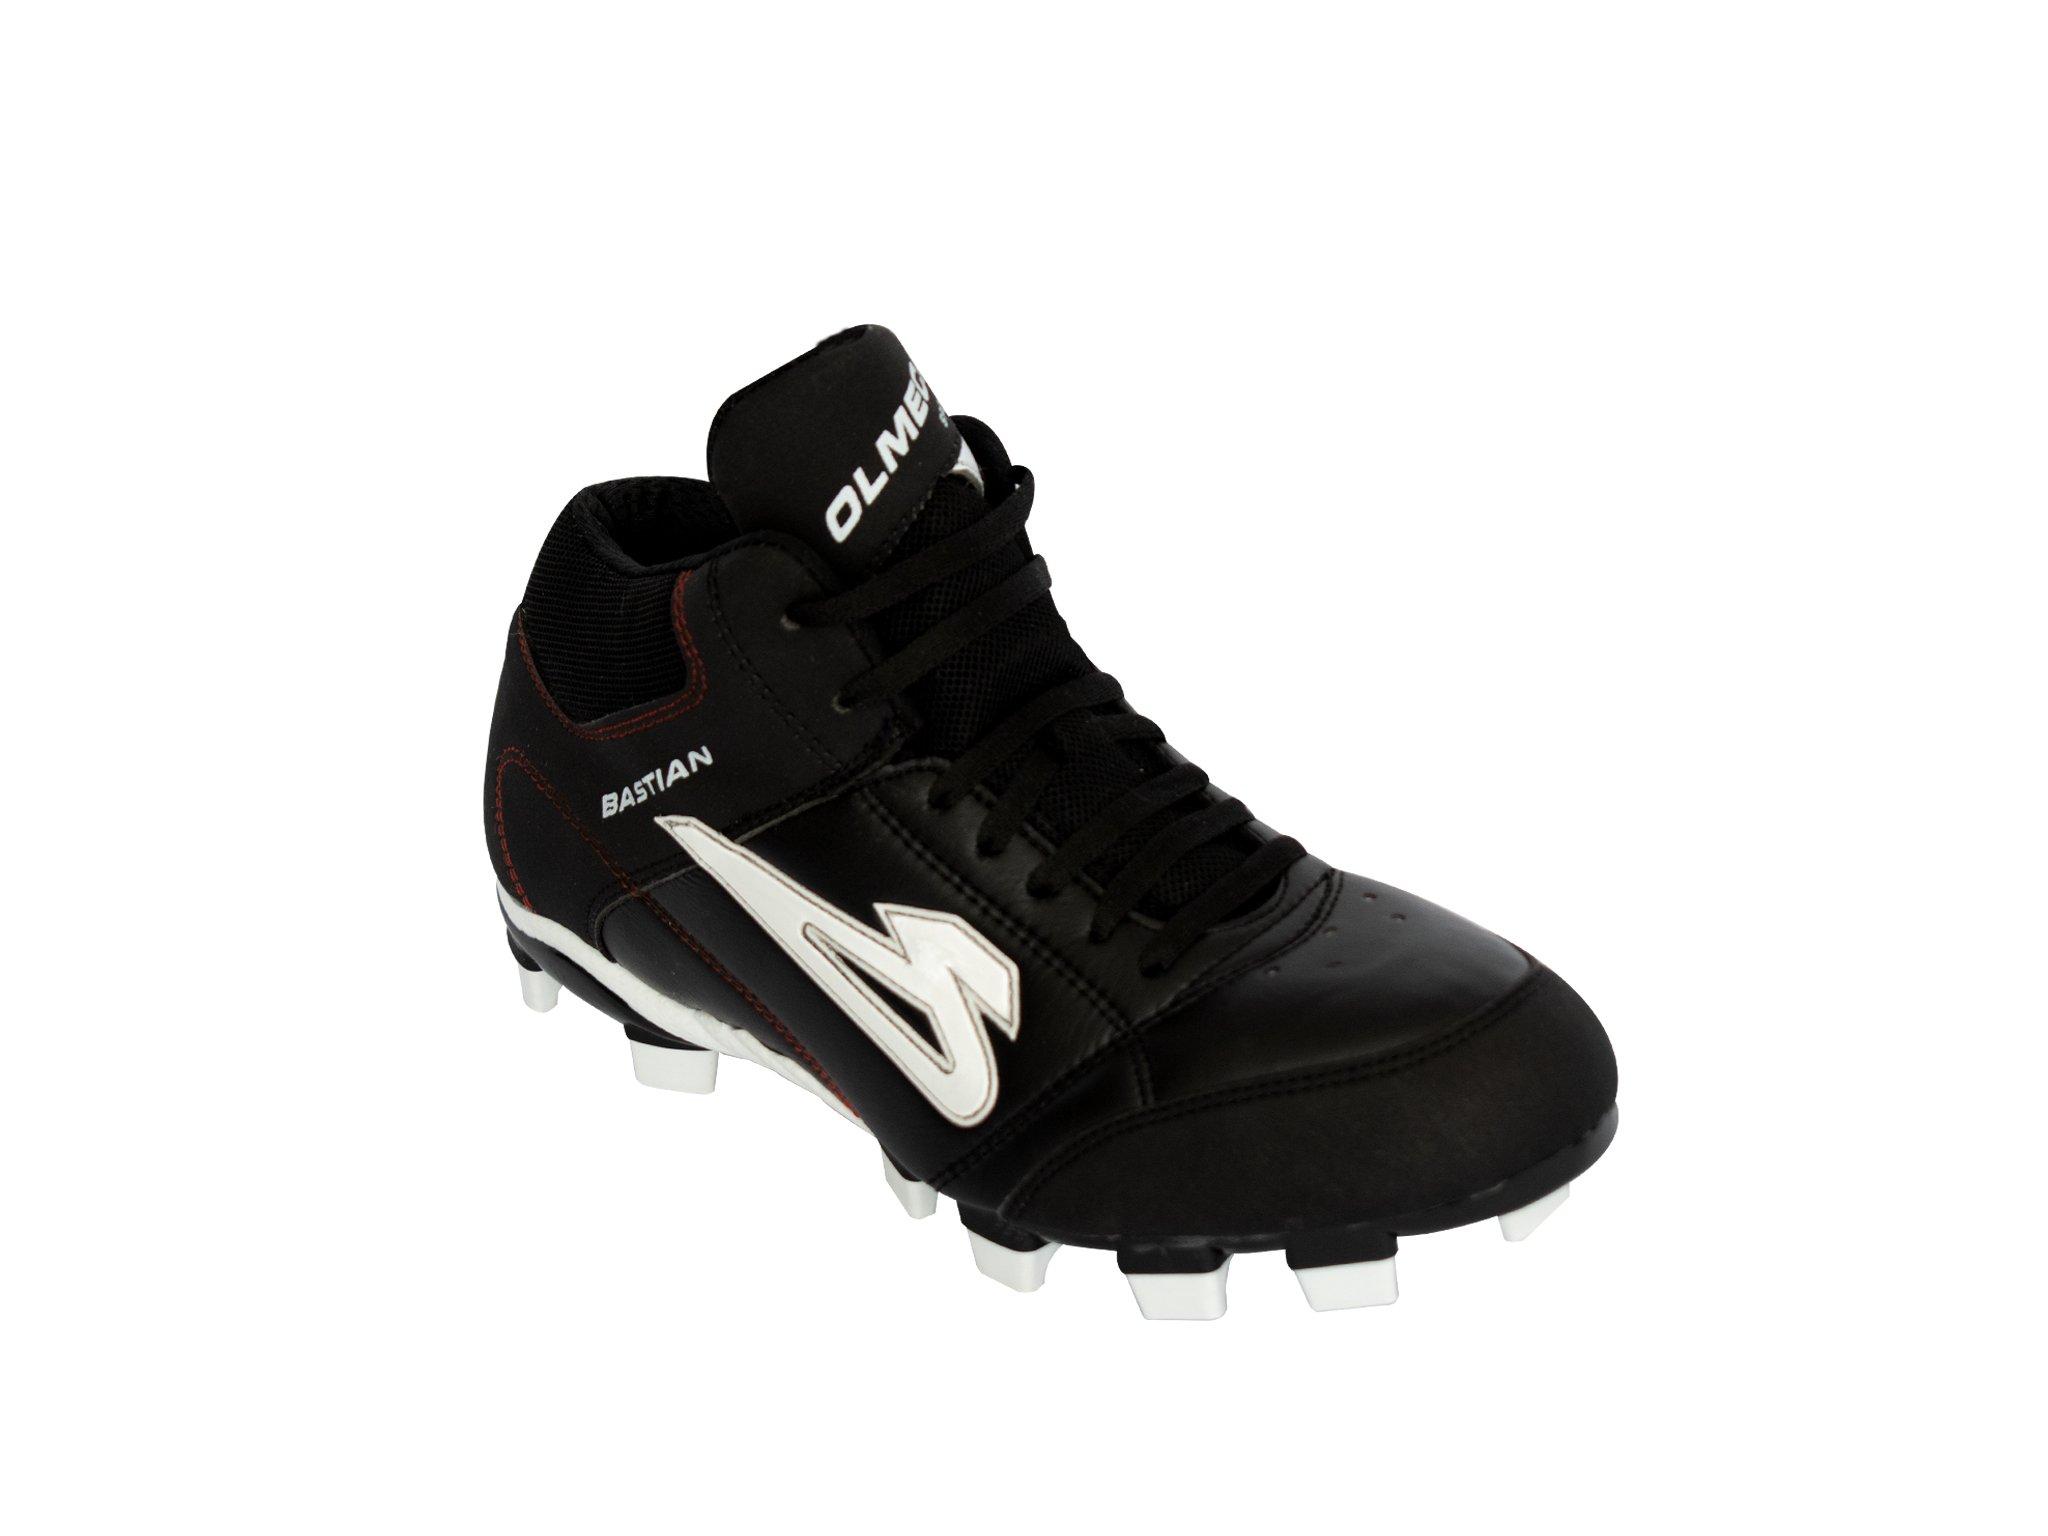 Zapato de Beisbol Olmeca mod. bastian negro